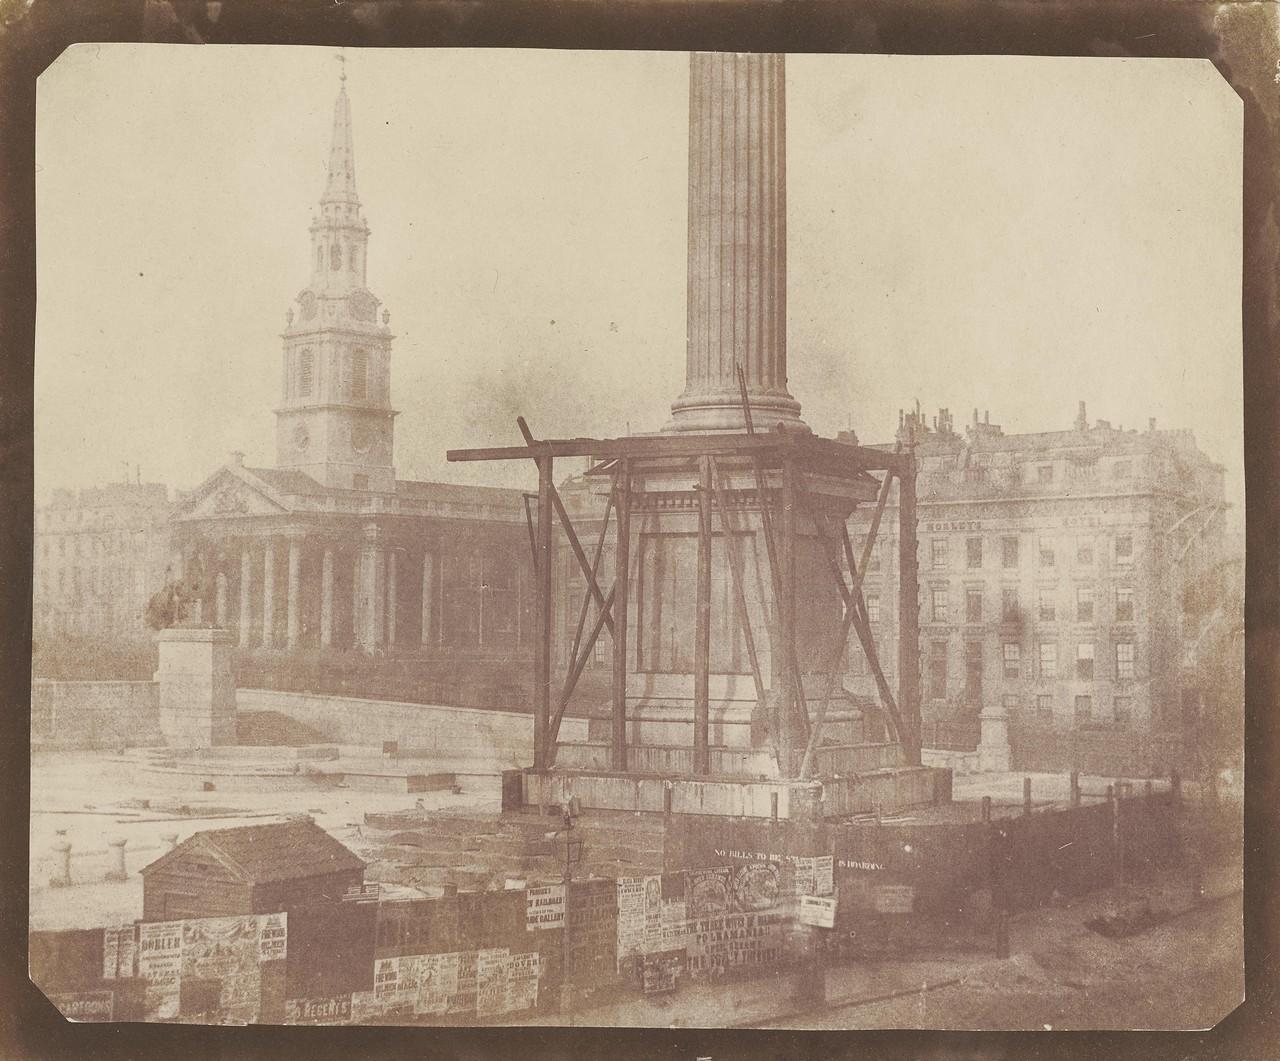 1843_a_londoni_nelson-oszlop_epitese_a_trafalgar_teren.jpeg